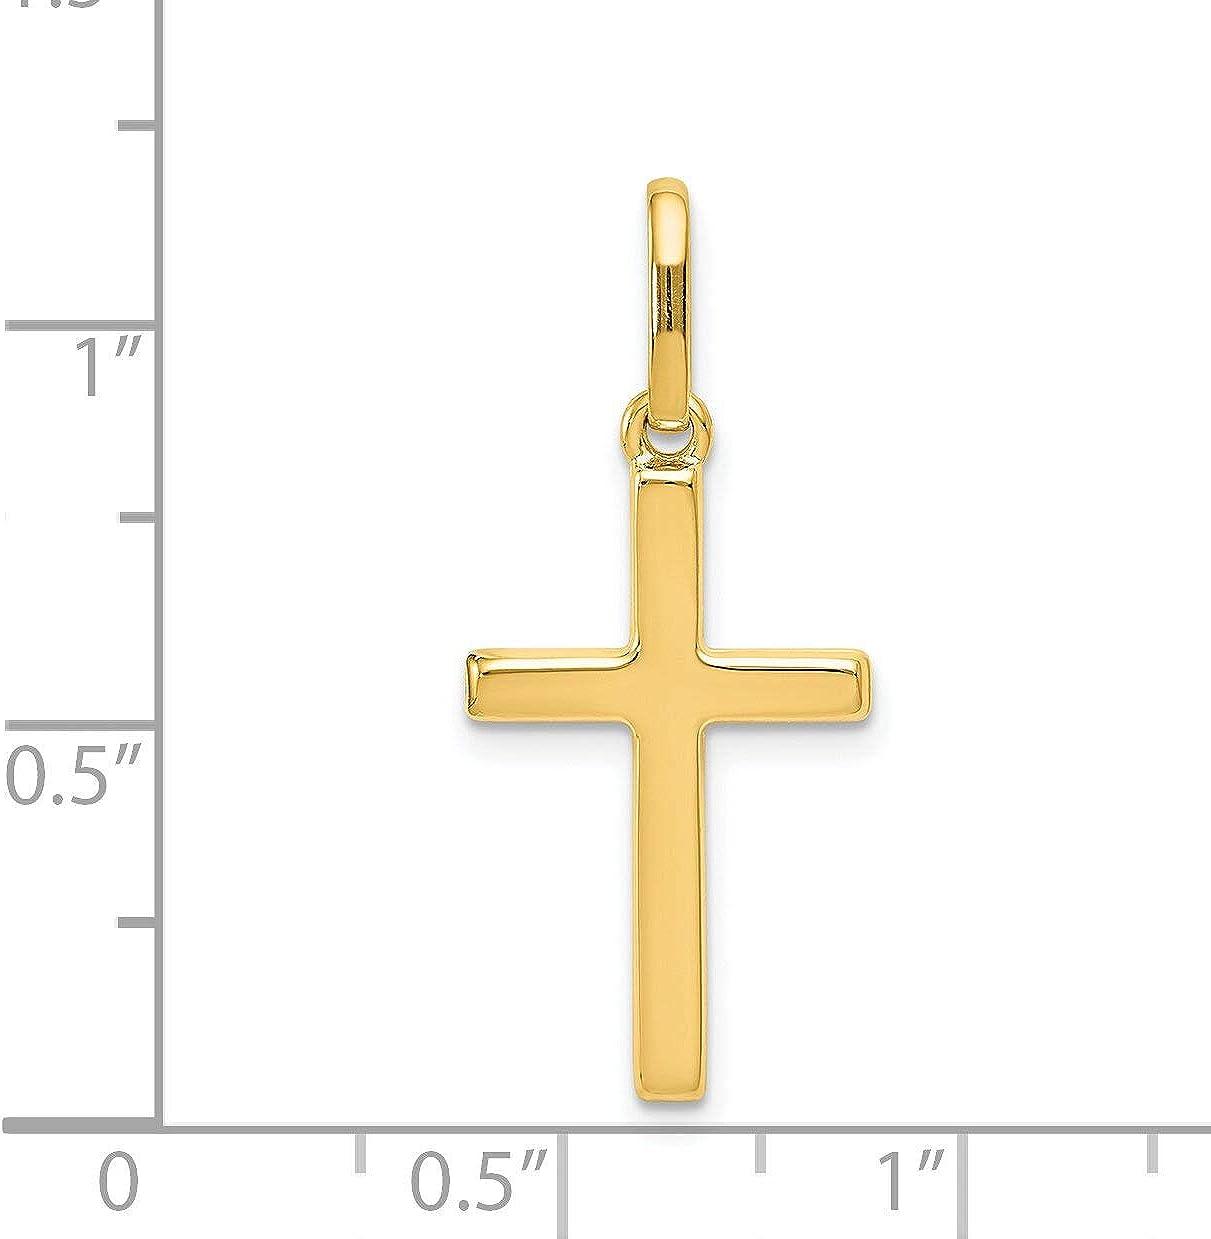 14K Yellow Gold Cross Pendant Charm Religious 30mm (1.18